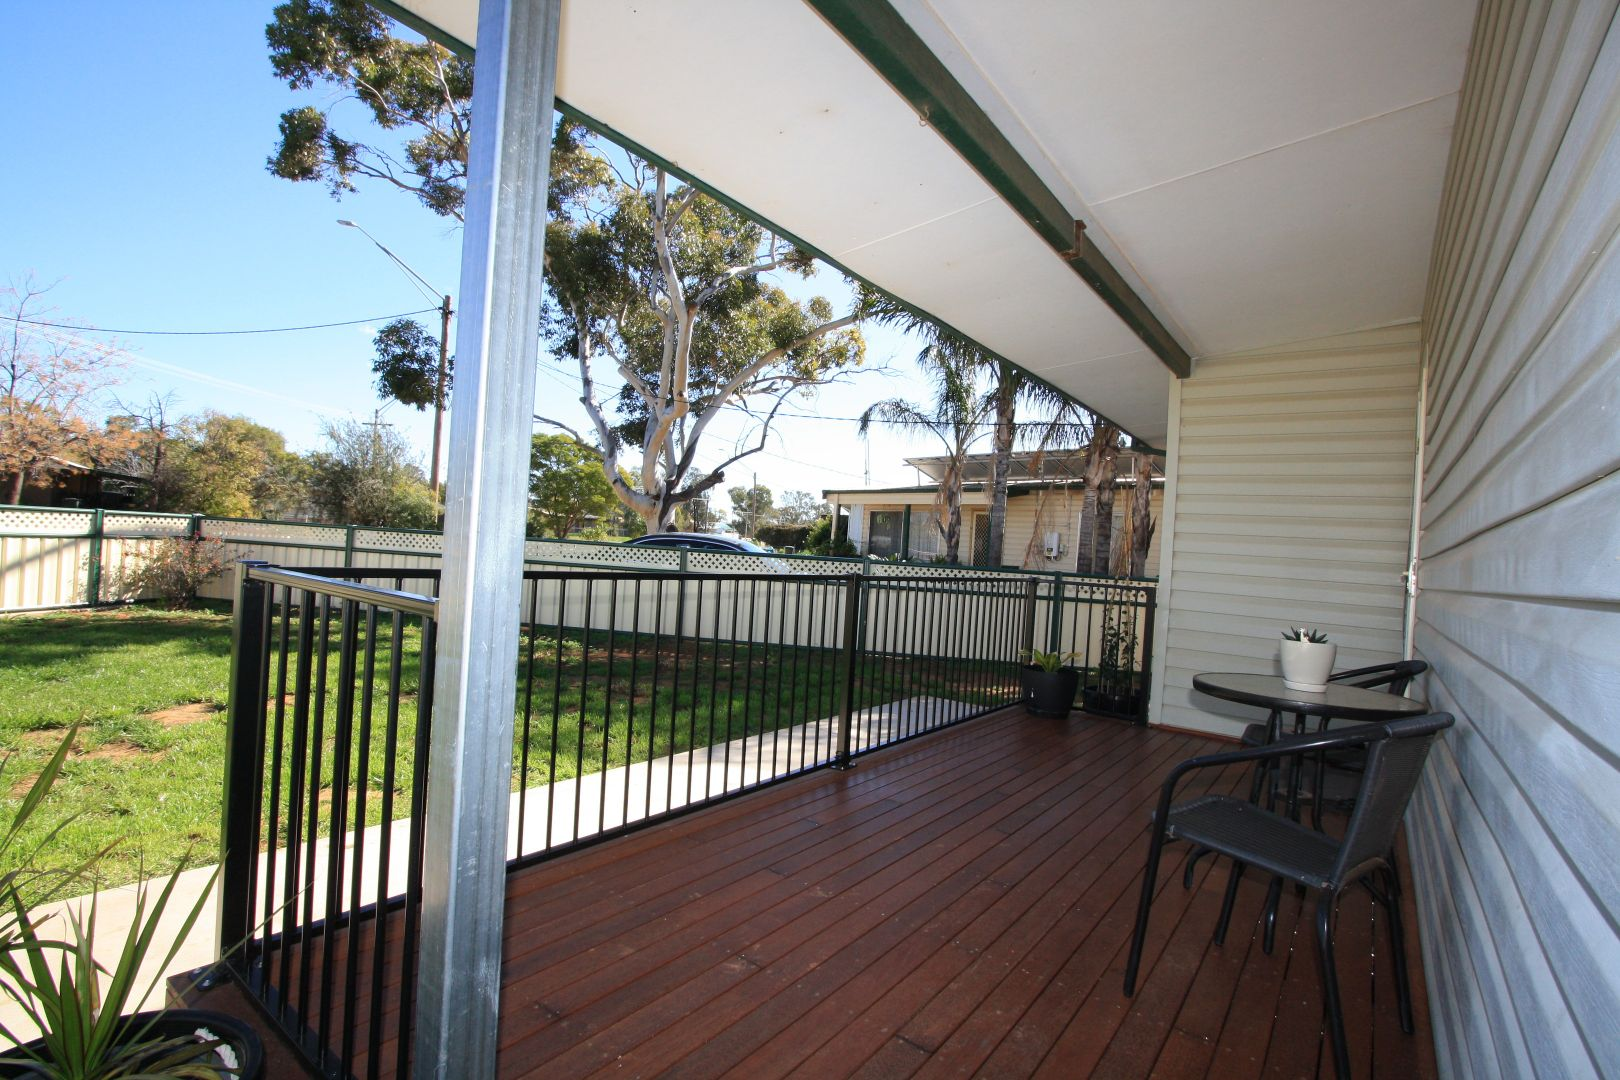 45 LOUTH RD, Cobar NSW 2835, Image 1